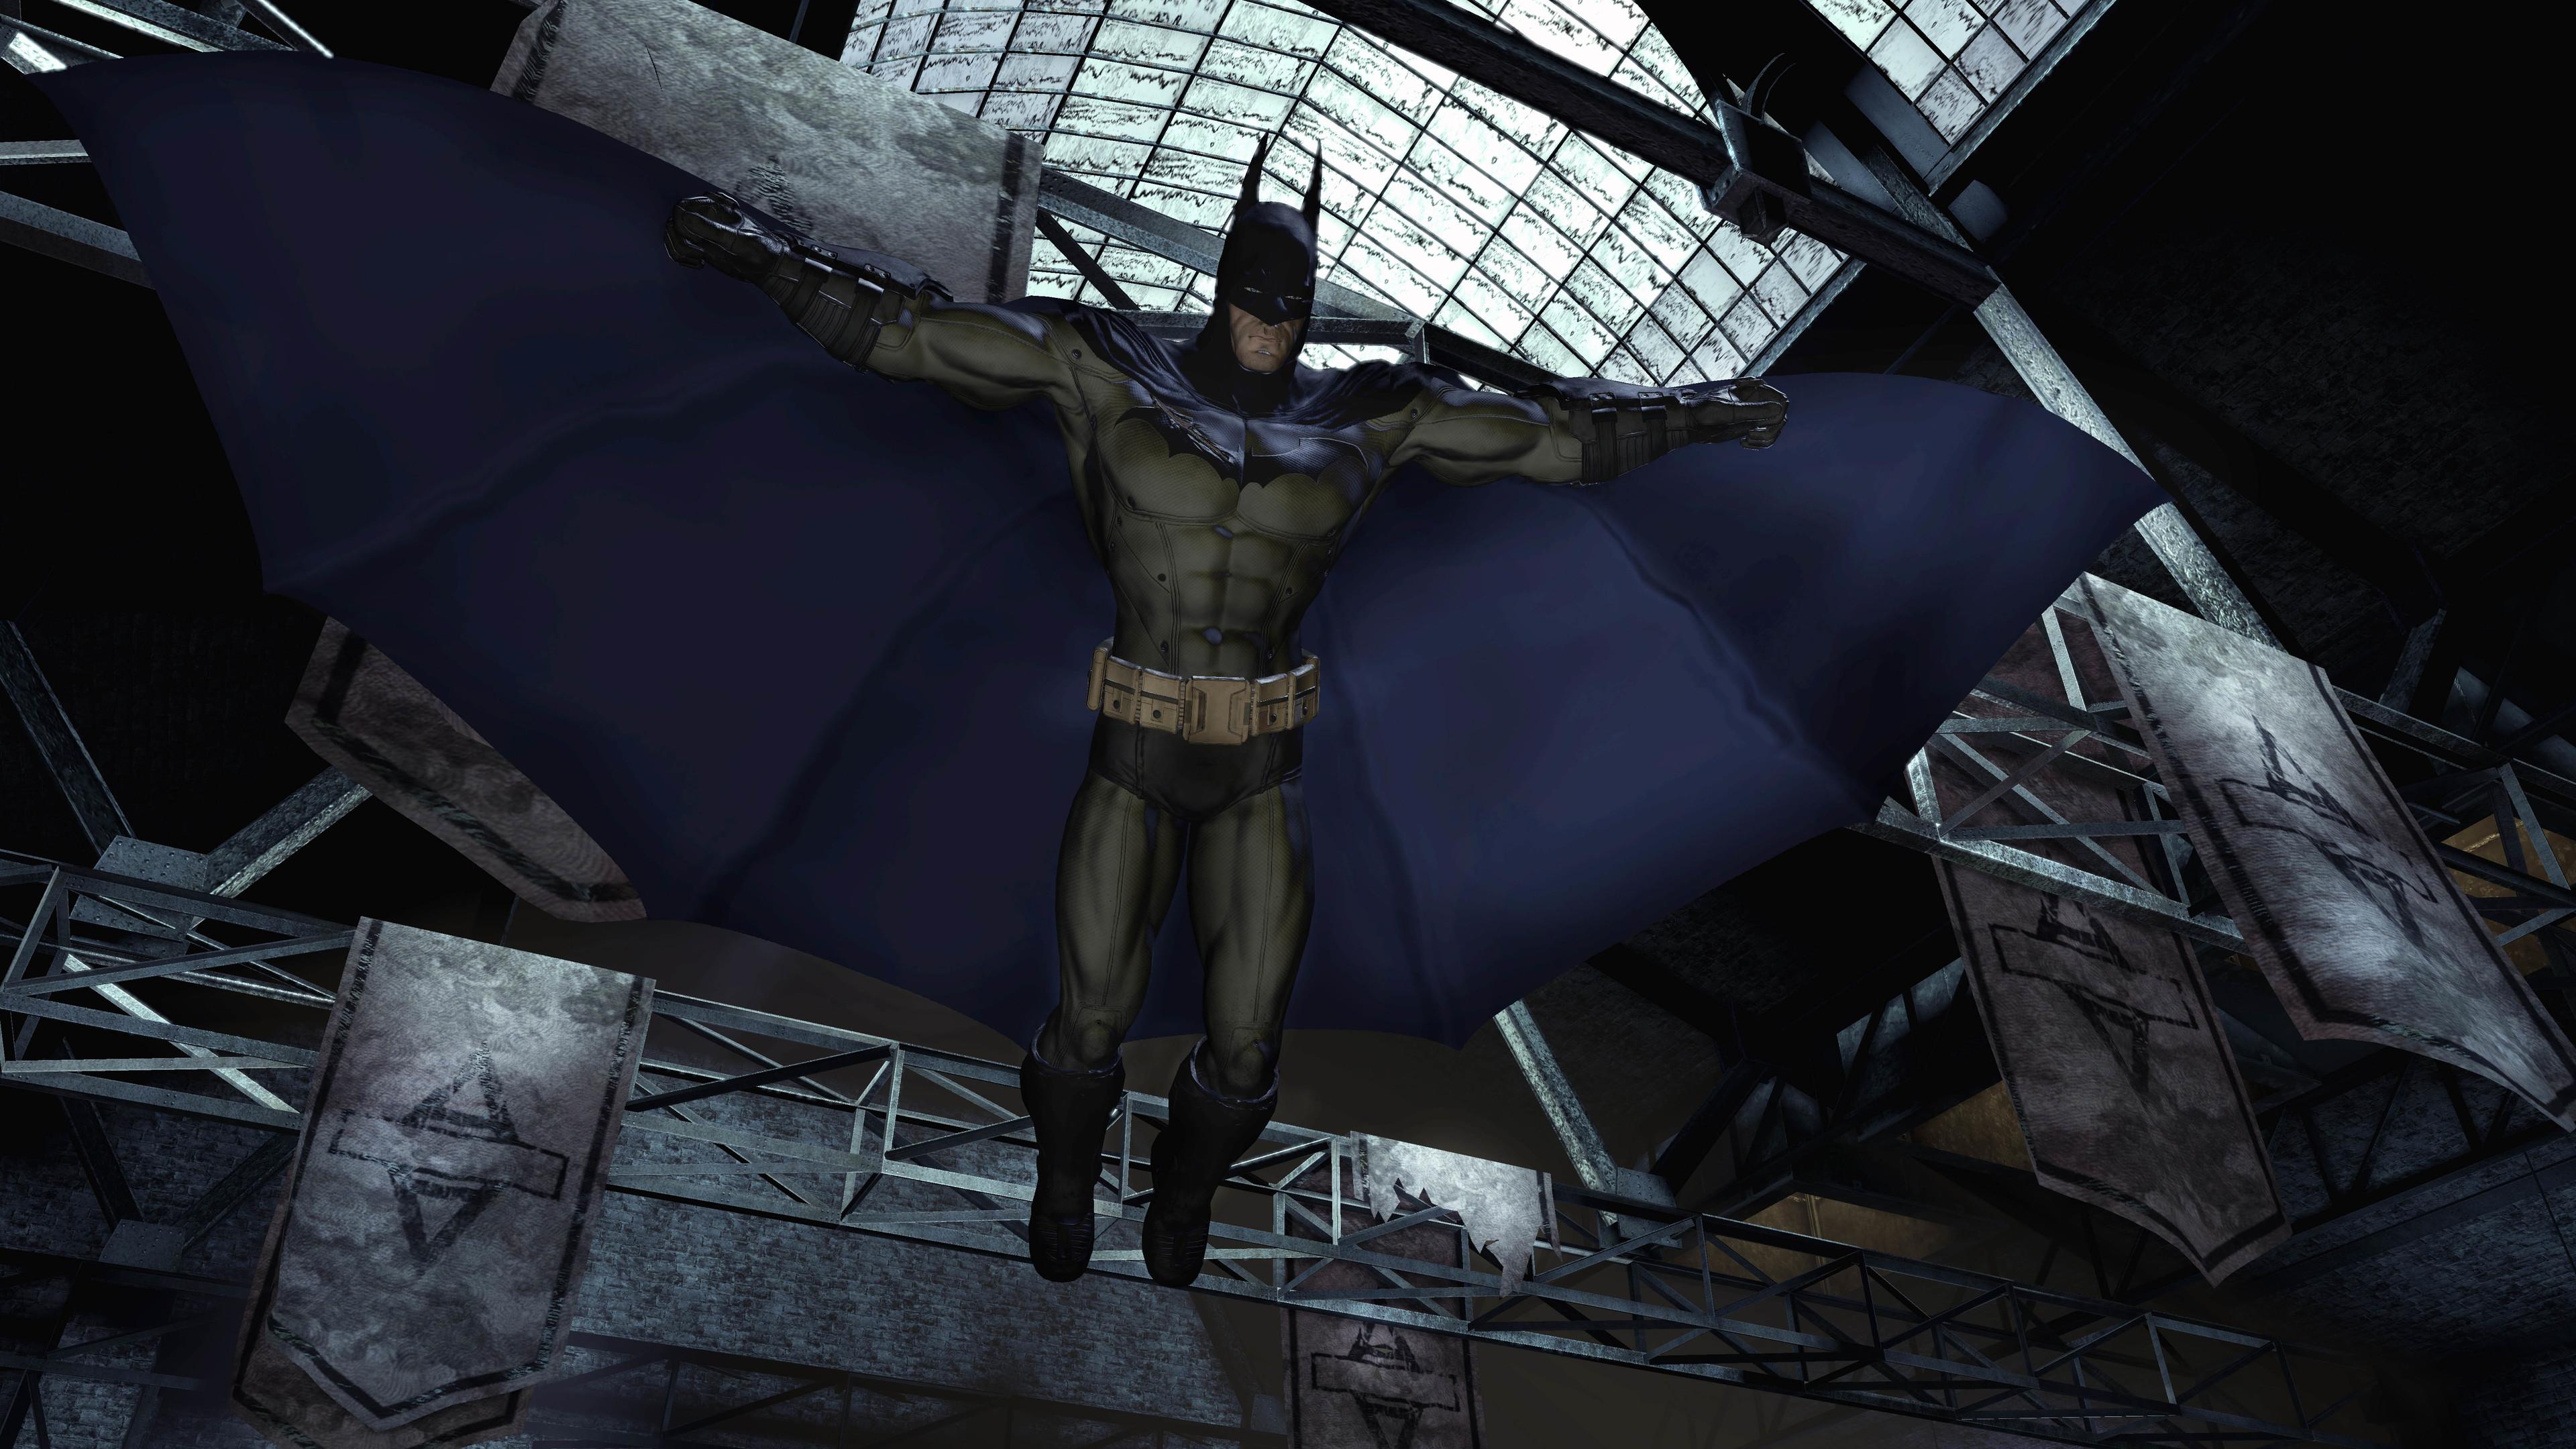 batman digital art 5k 1536524072 - Batman Digital Art 5k - superheroes wallpapers, hd-wallpapers, digital art wallpapers, batman wallpapers, artwork wallpapers, 5k wallpapers, 4k-wallpapers